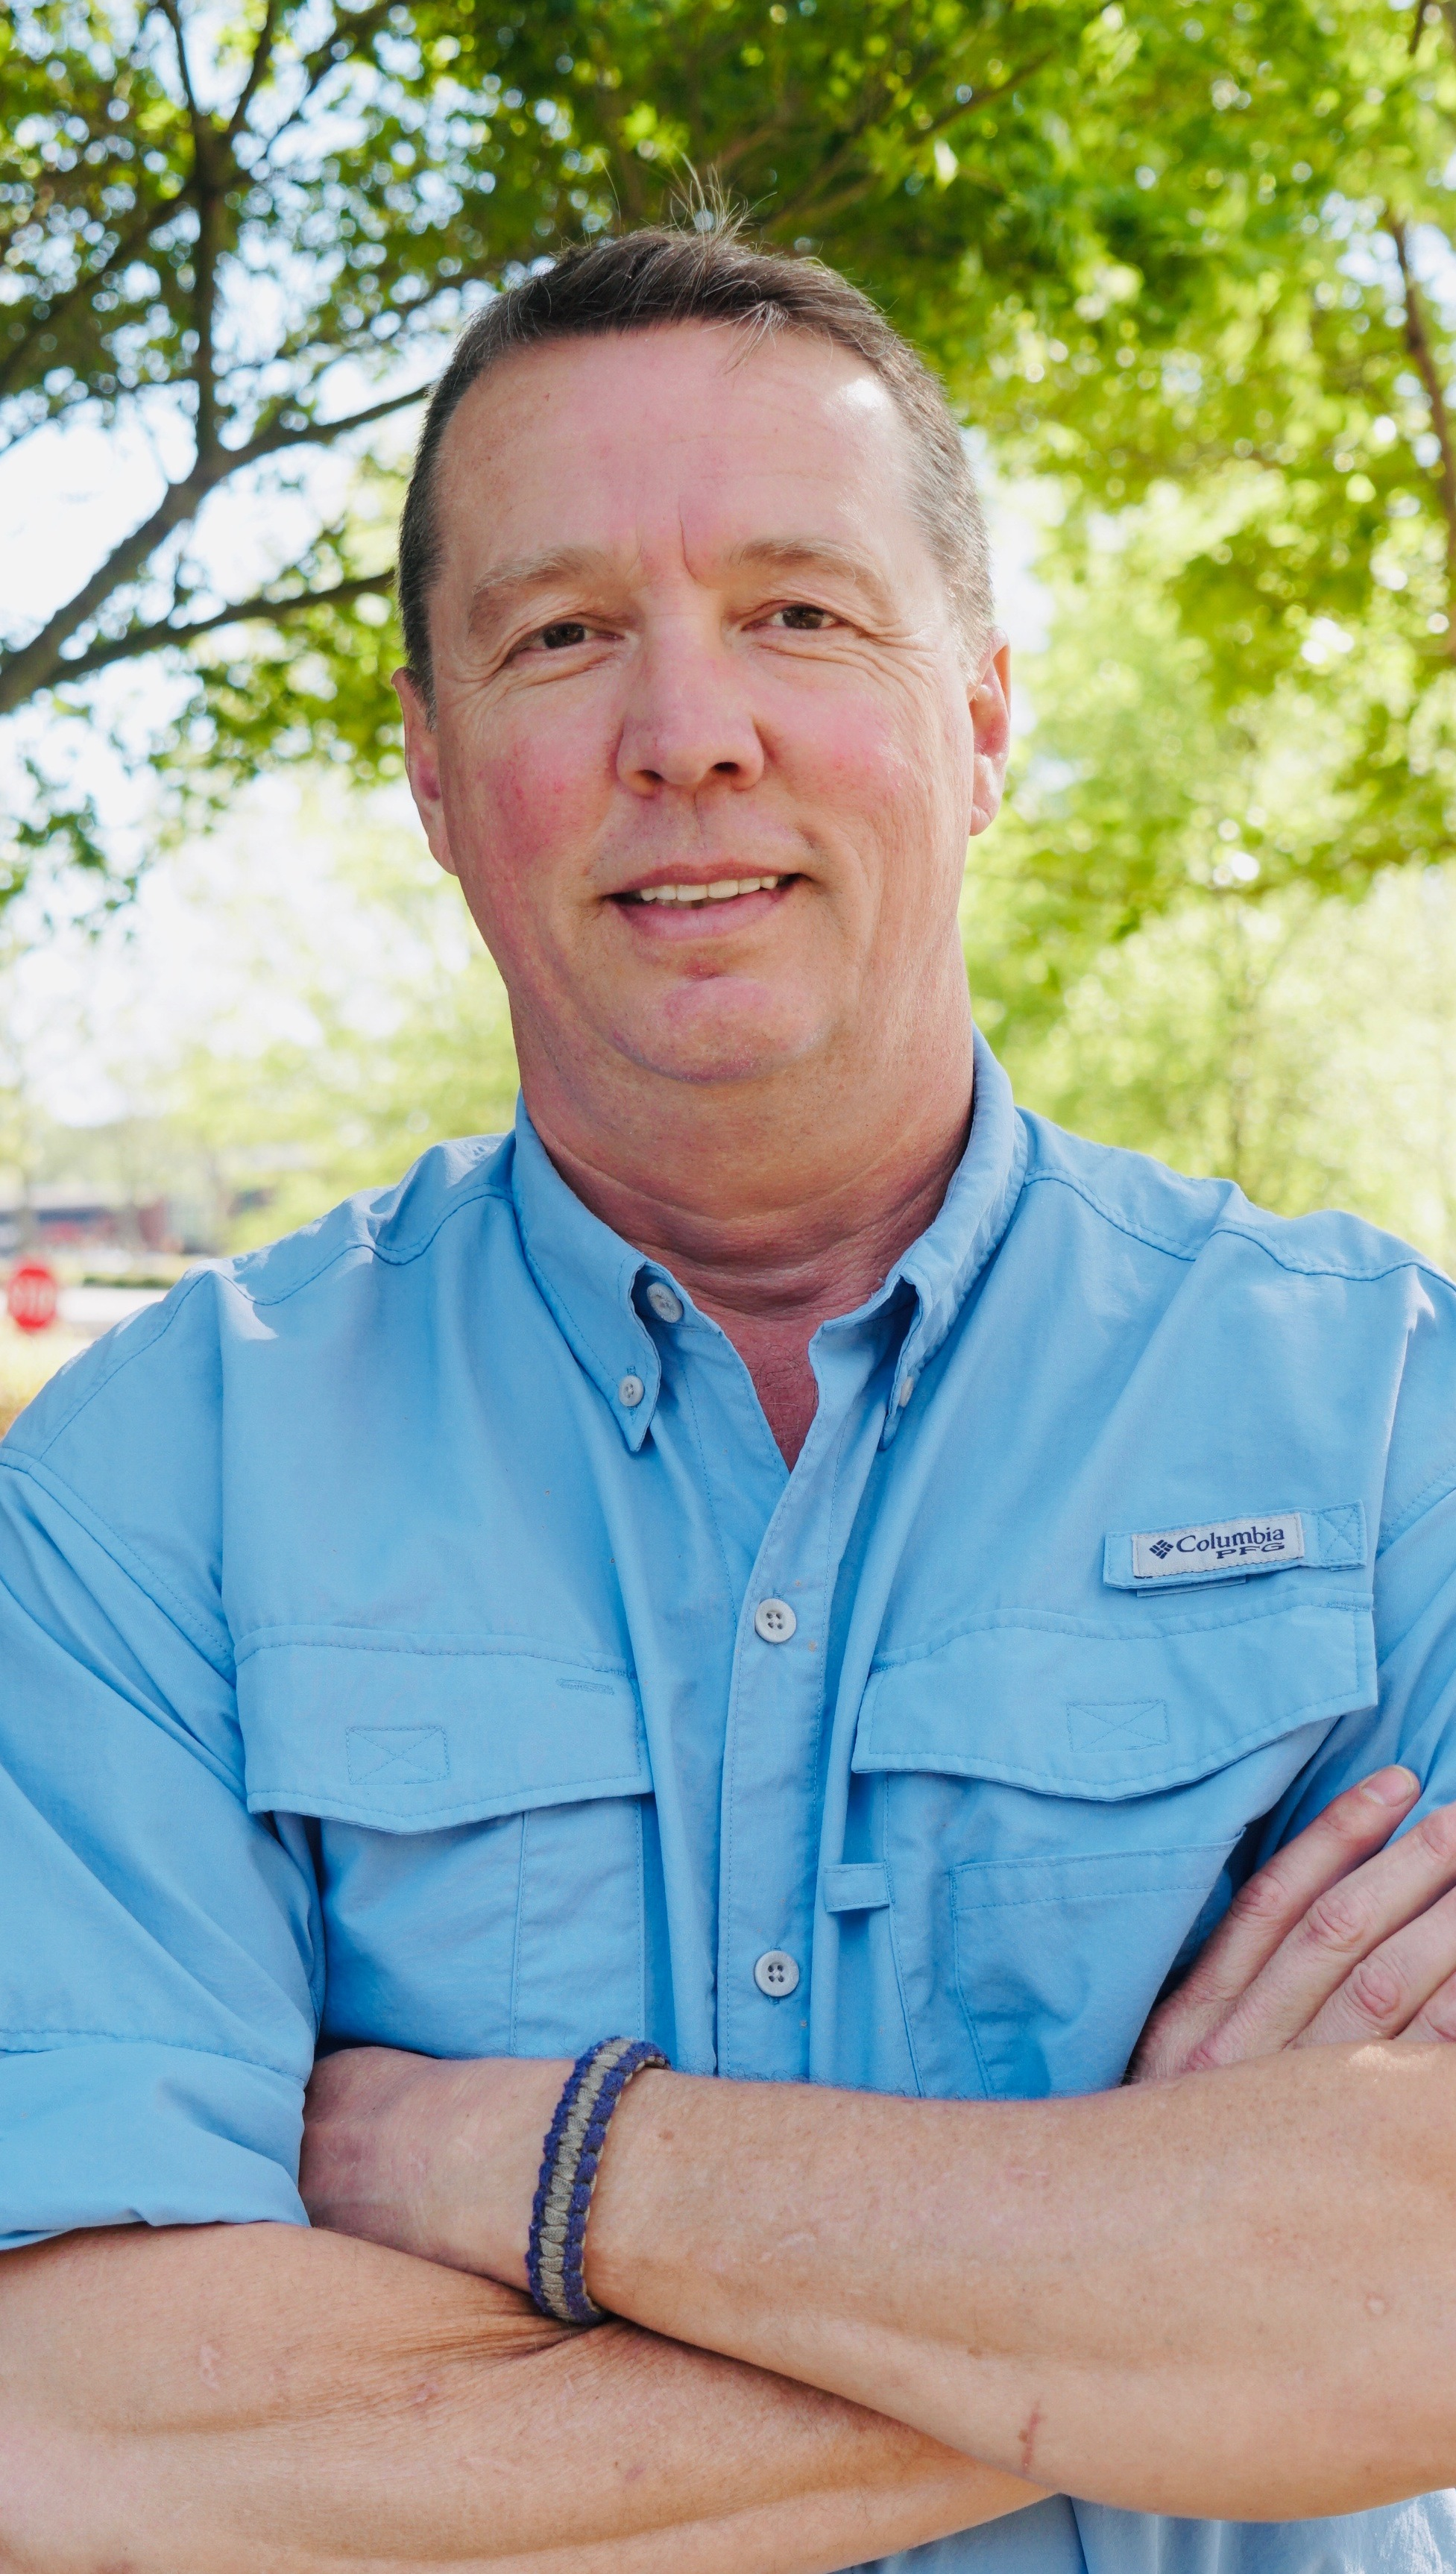 Greg Cox | Vice President, Board Member   - Servant - Worker  - Husband, Friend, Brother